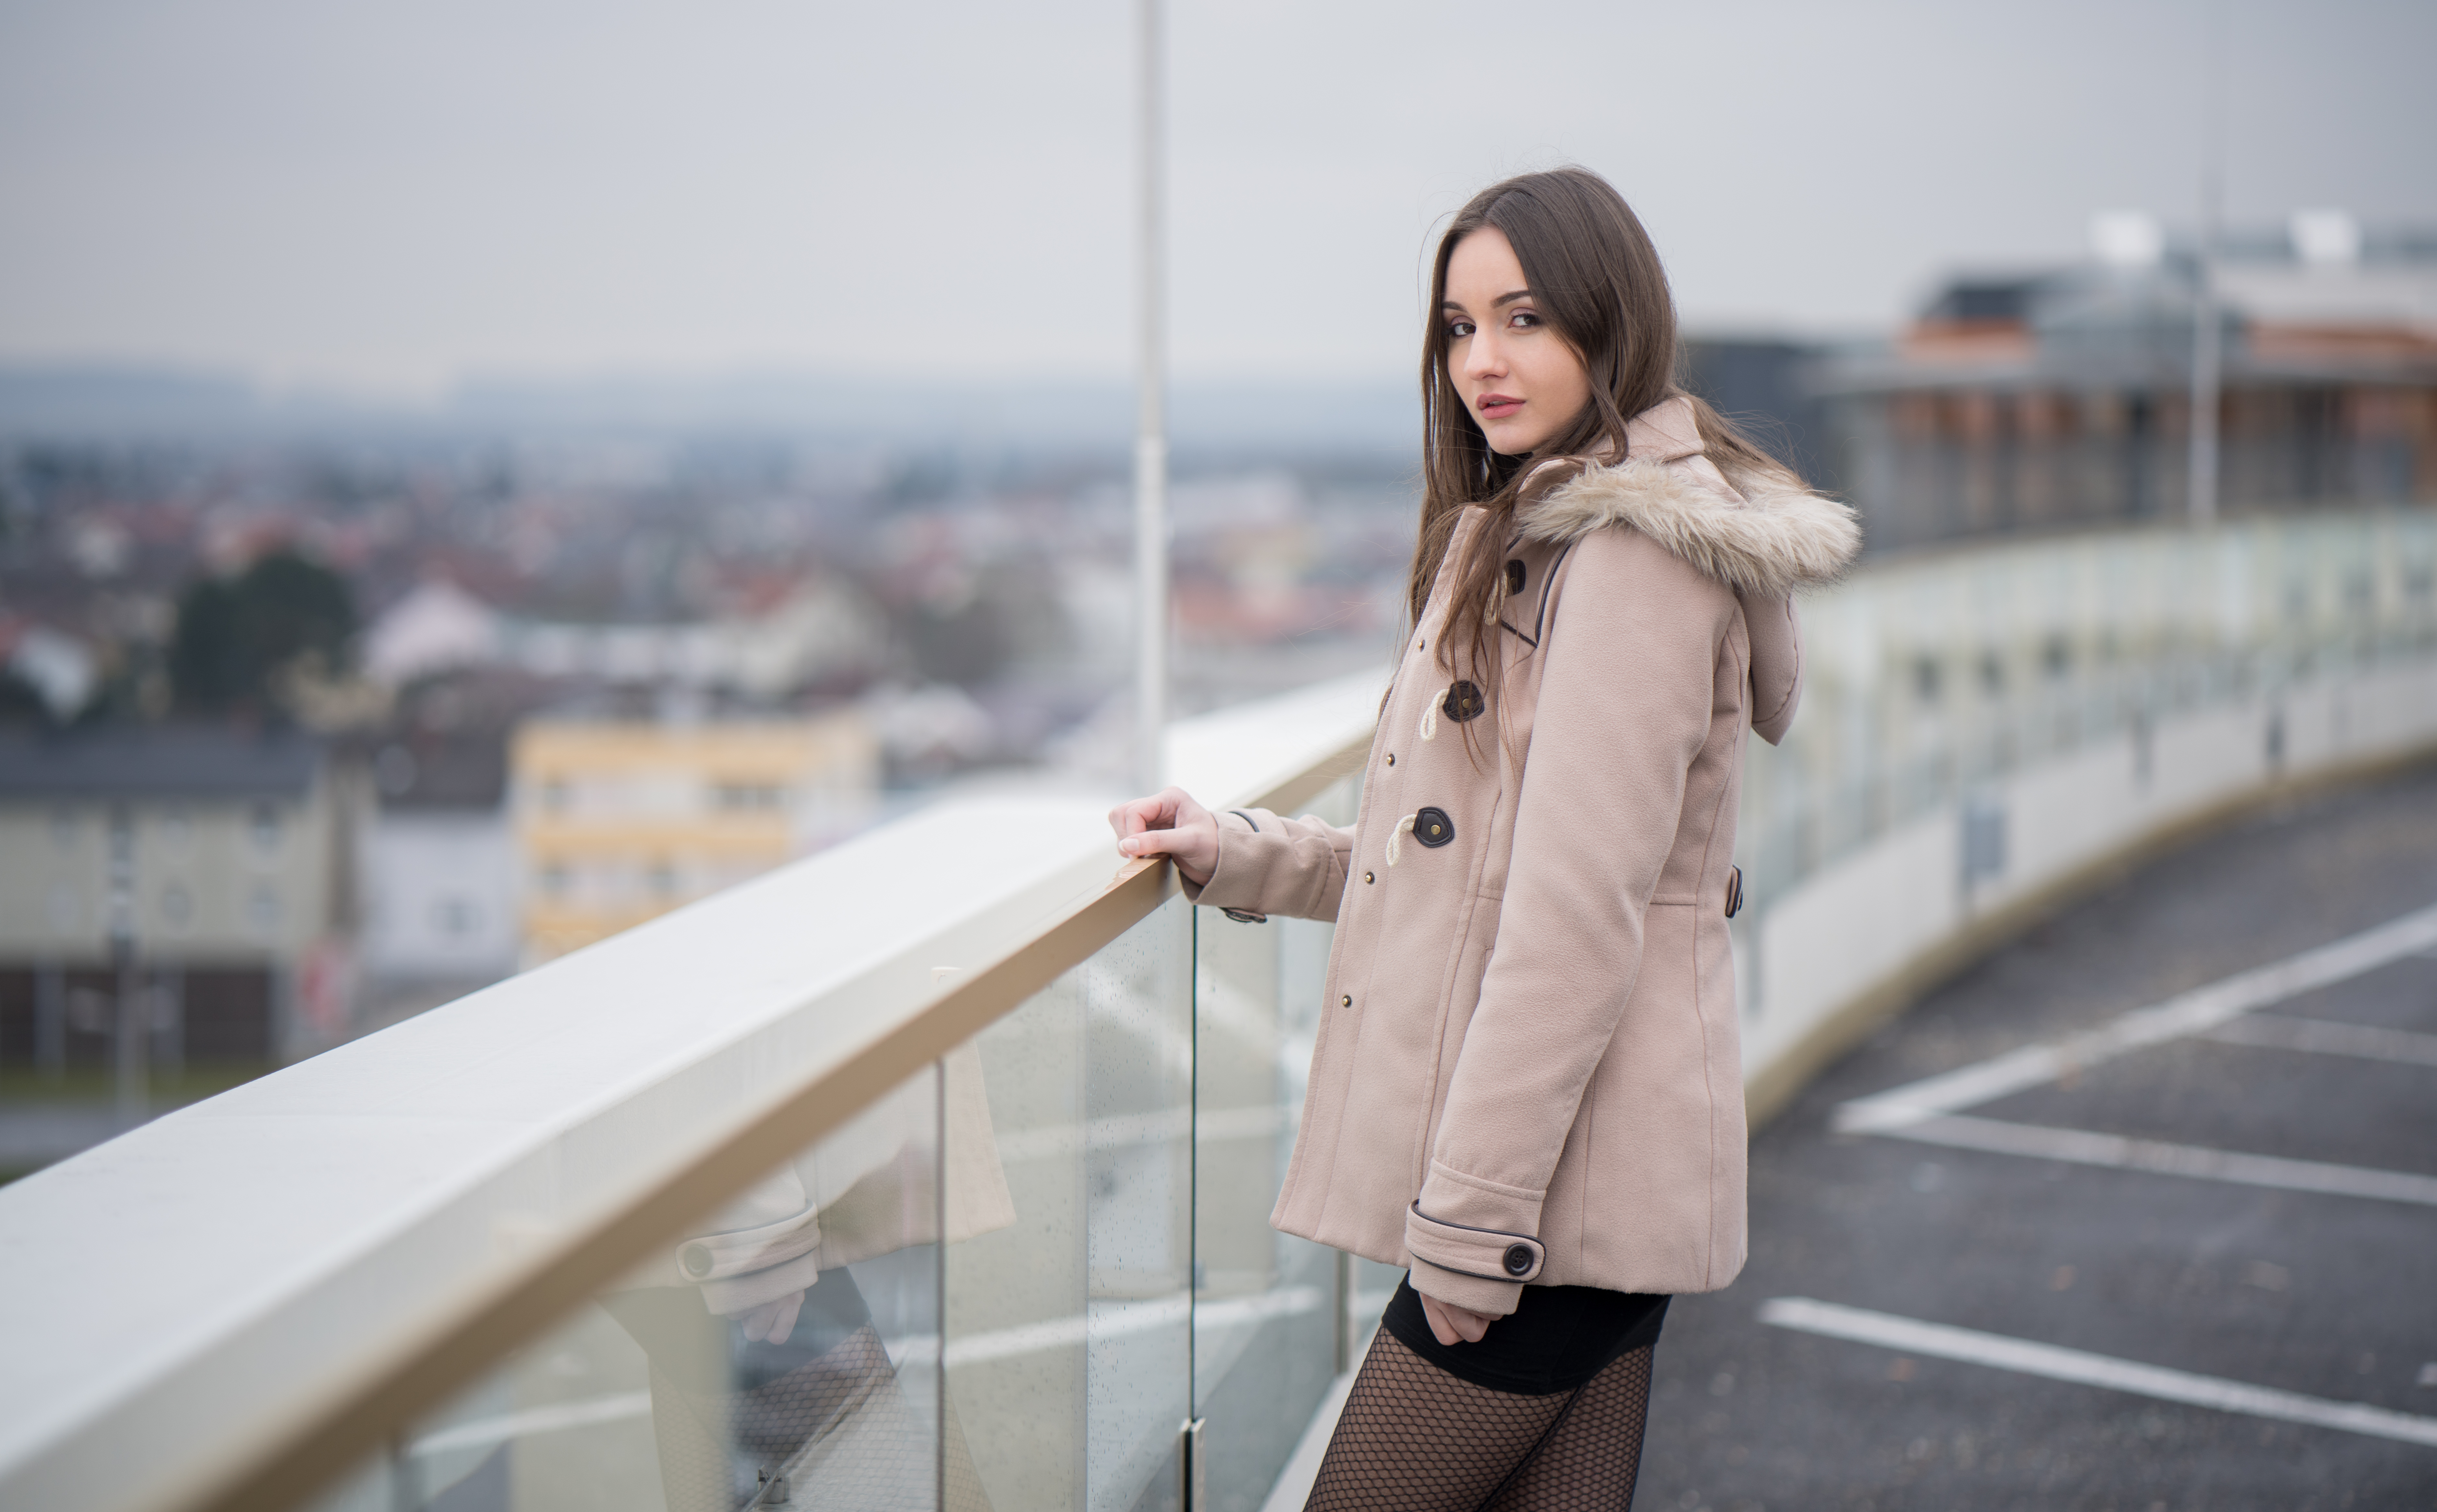 girl standing roof side 1575665980 - Girl Standing Roof side -